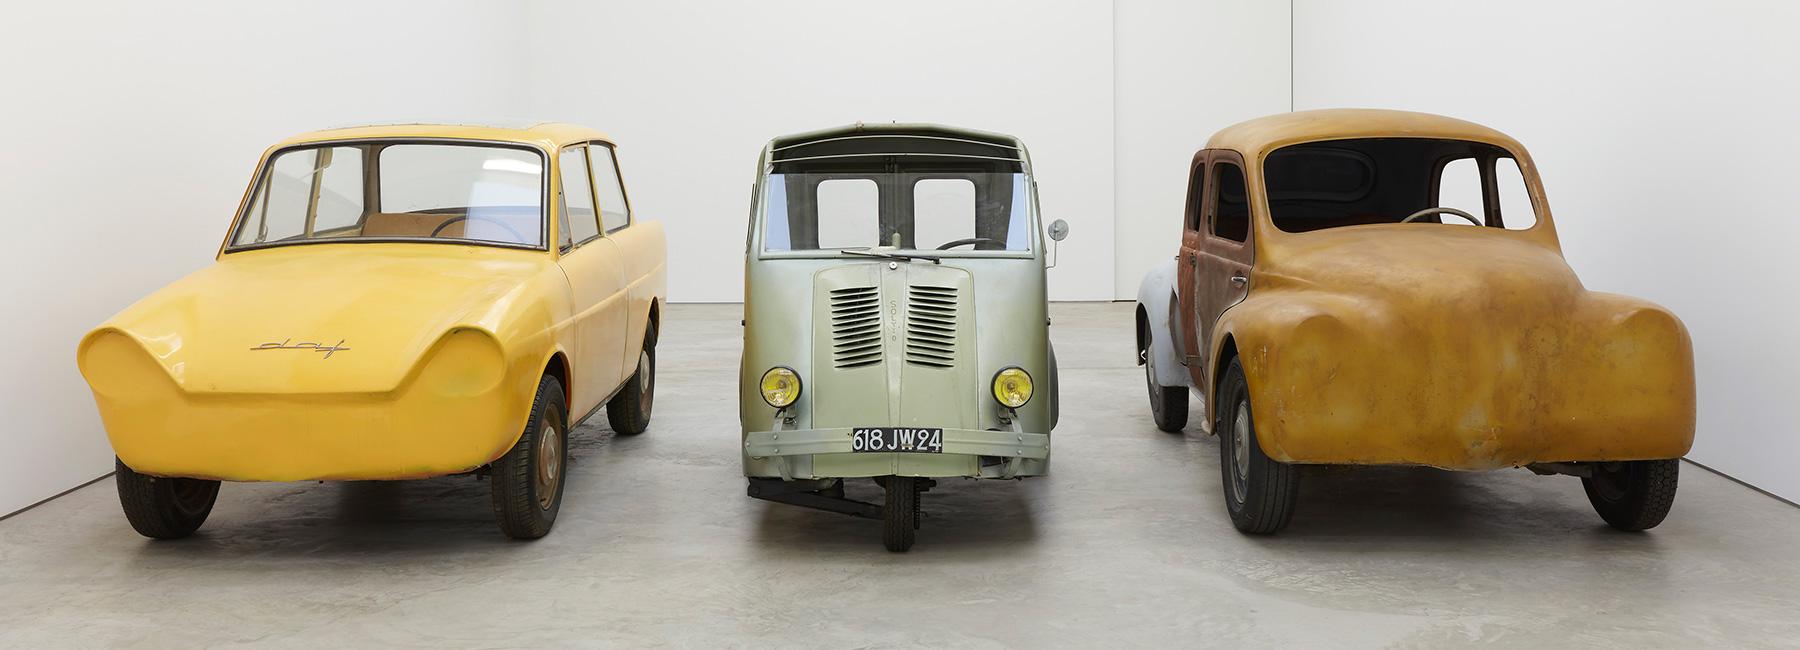 robert-grosvenor-karma-cars- FAD magazine